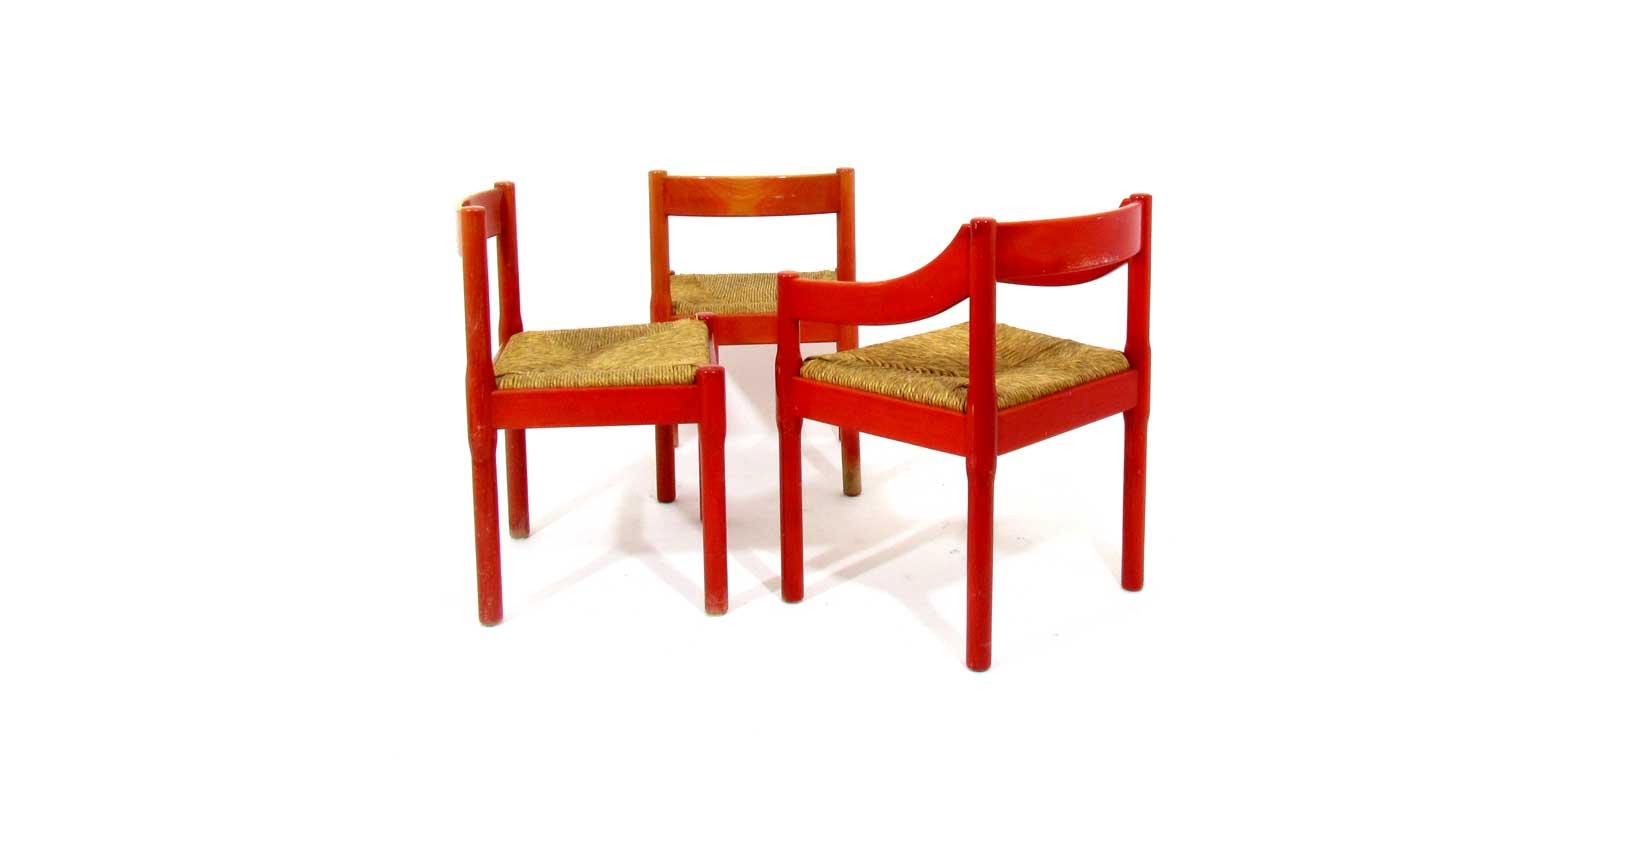 carimate vico magistretti cassina wooden chair straw seat vintage iconic design furniture